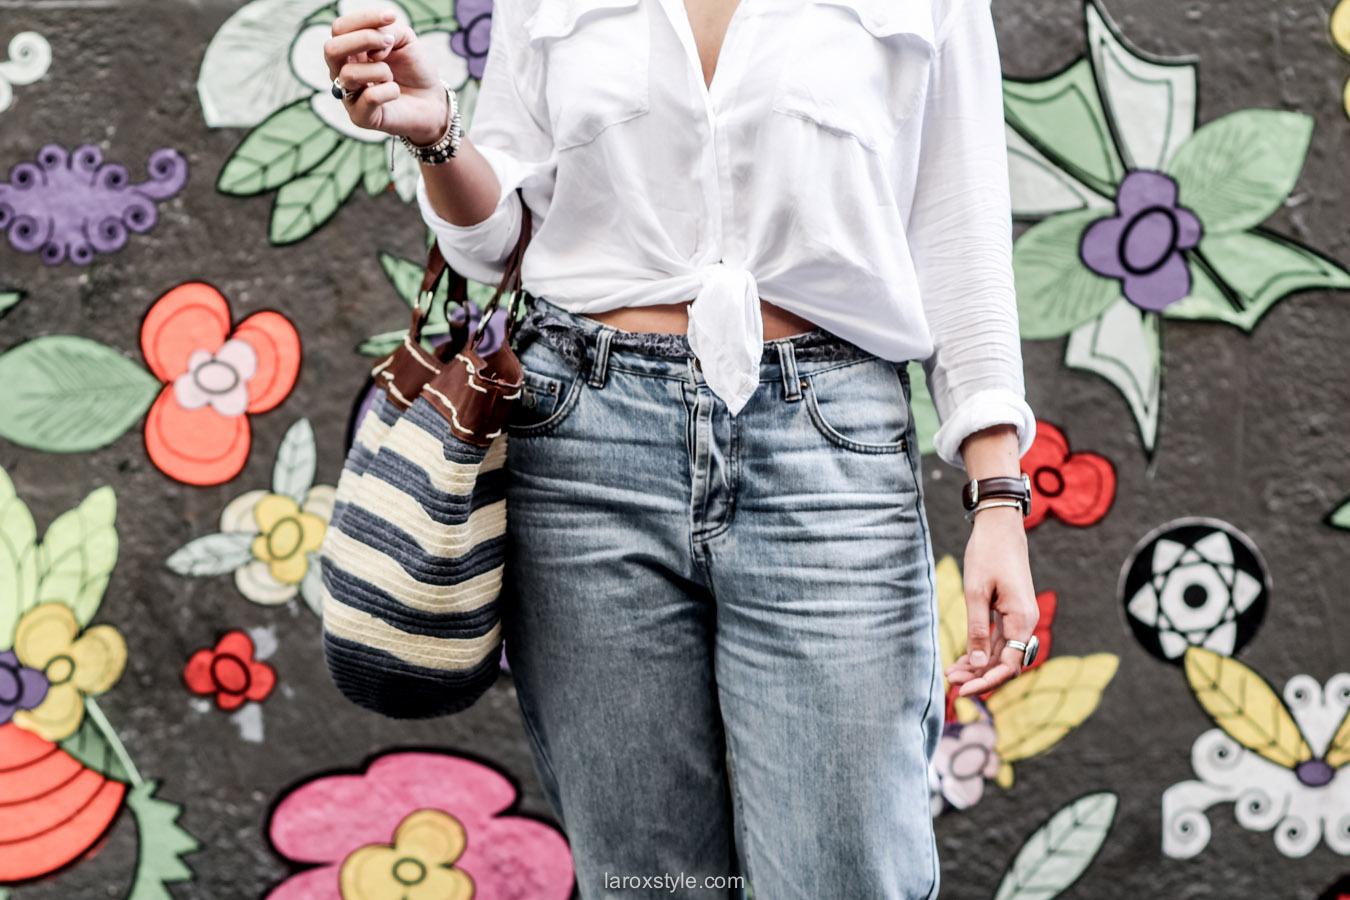 mom jean et chemise blanche - laroxstyle - blog mode lyon